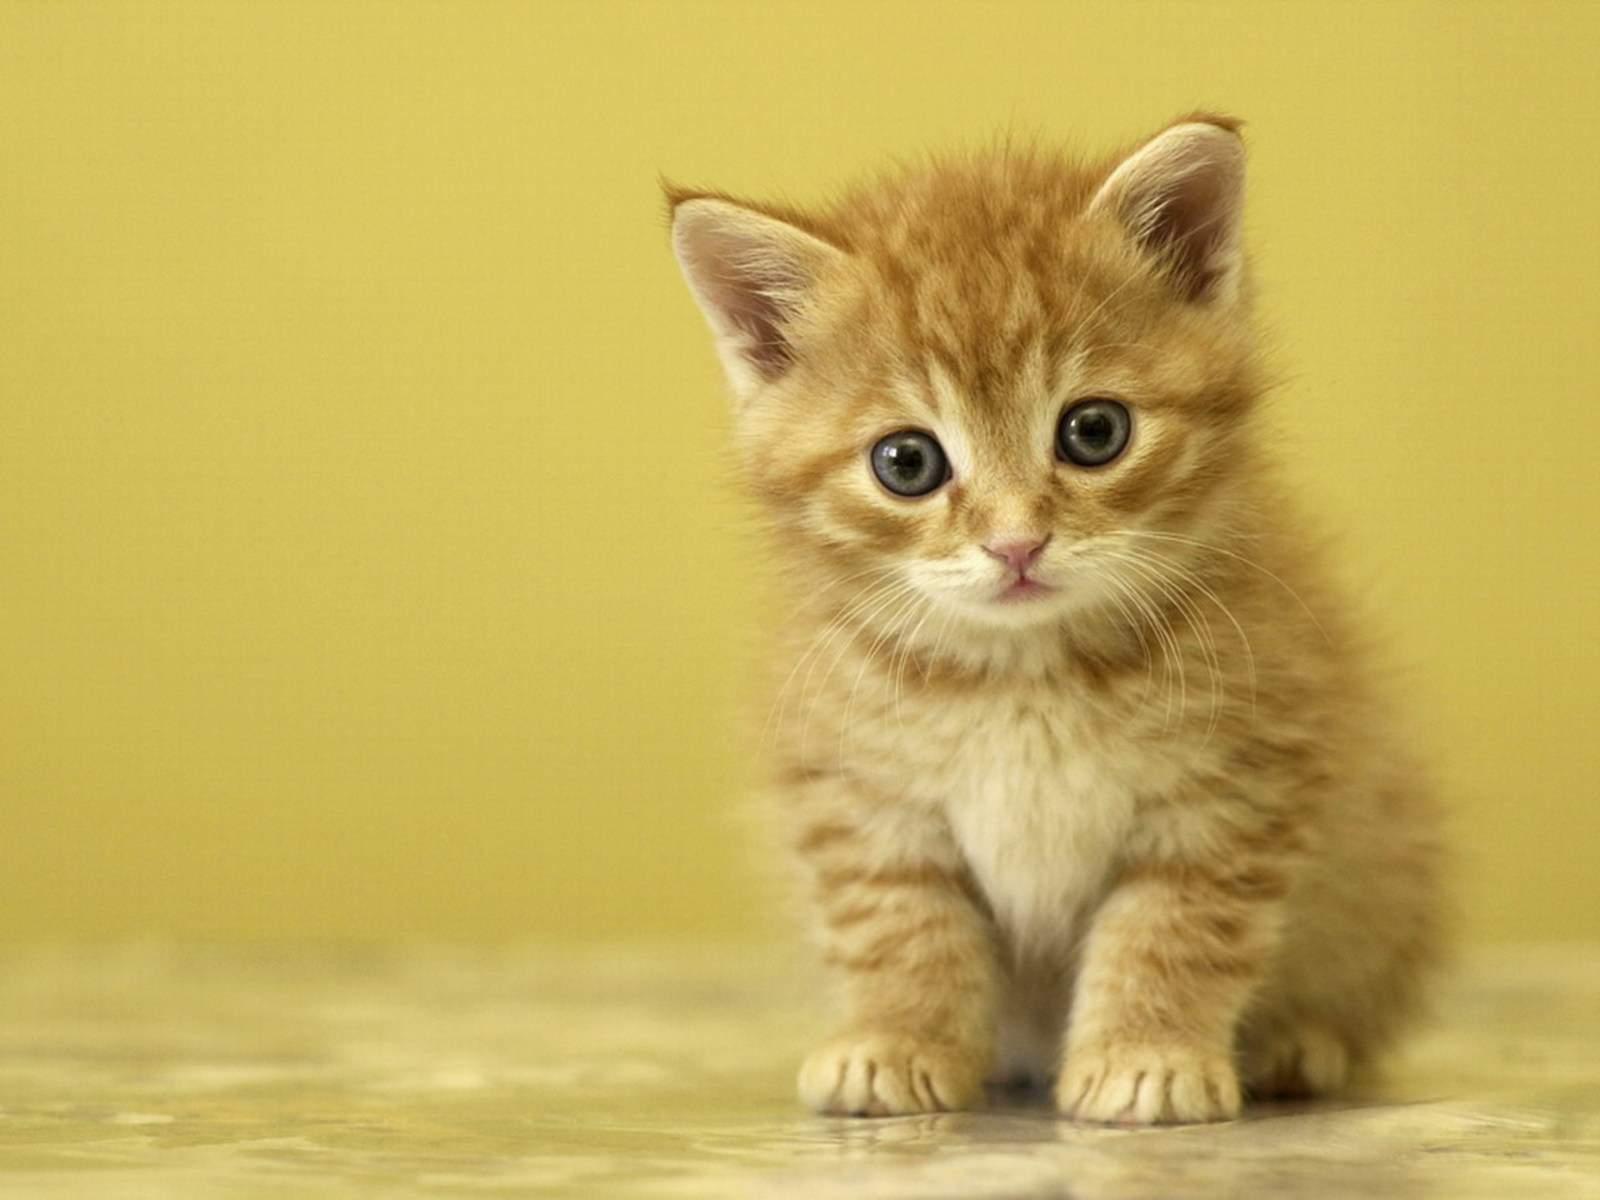 gambar kucing lucu terbaru - gambar kucing - gambar kucing lucu terbaru